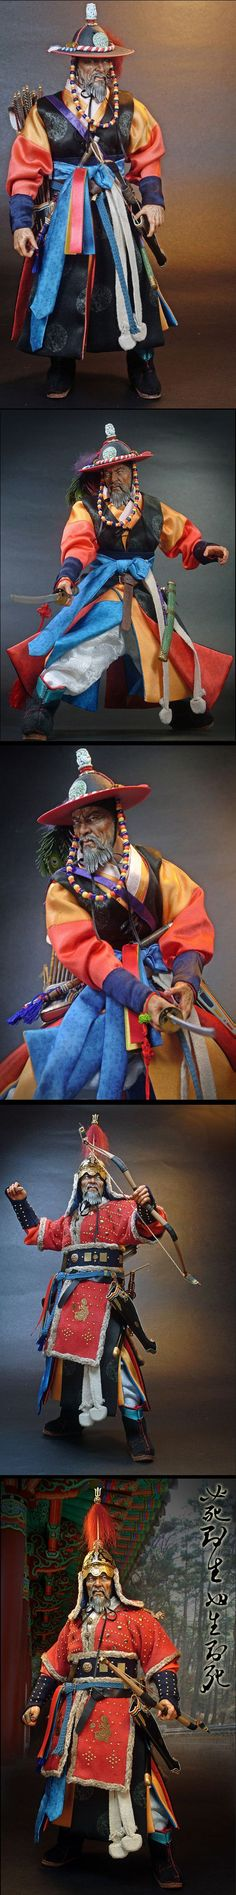 TORIBOX-Figure Outfit #art from #Korea